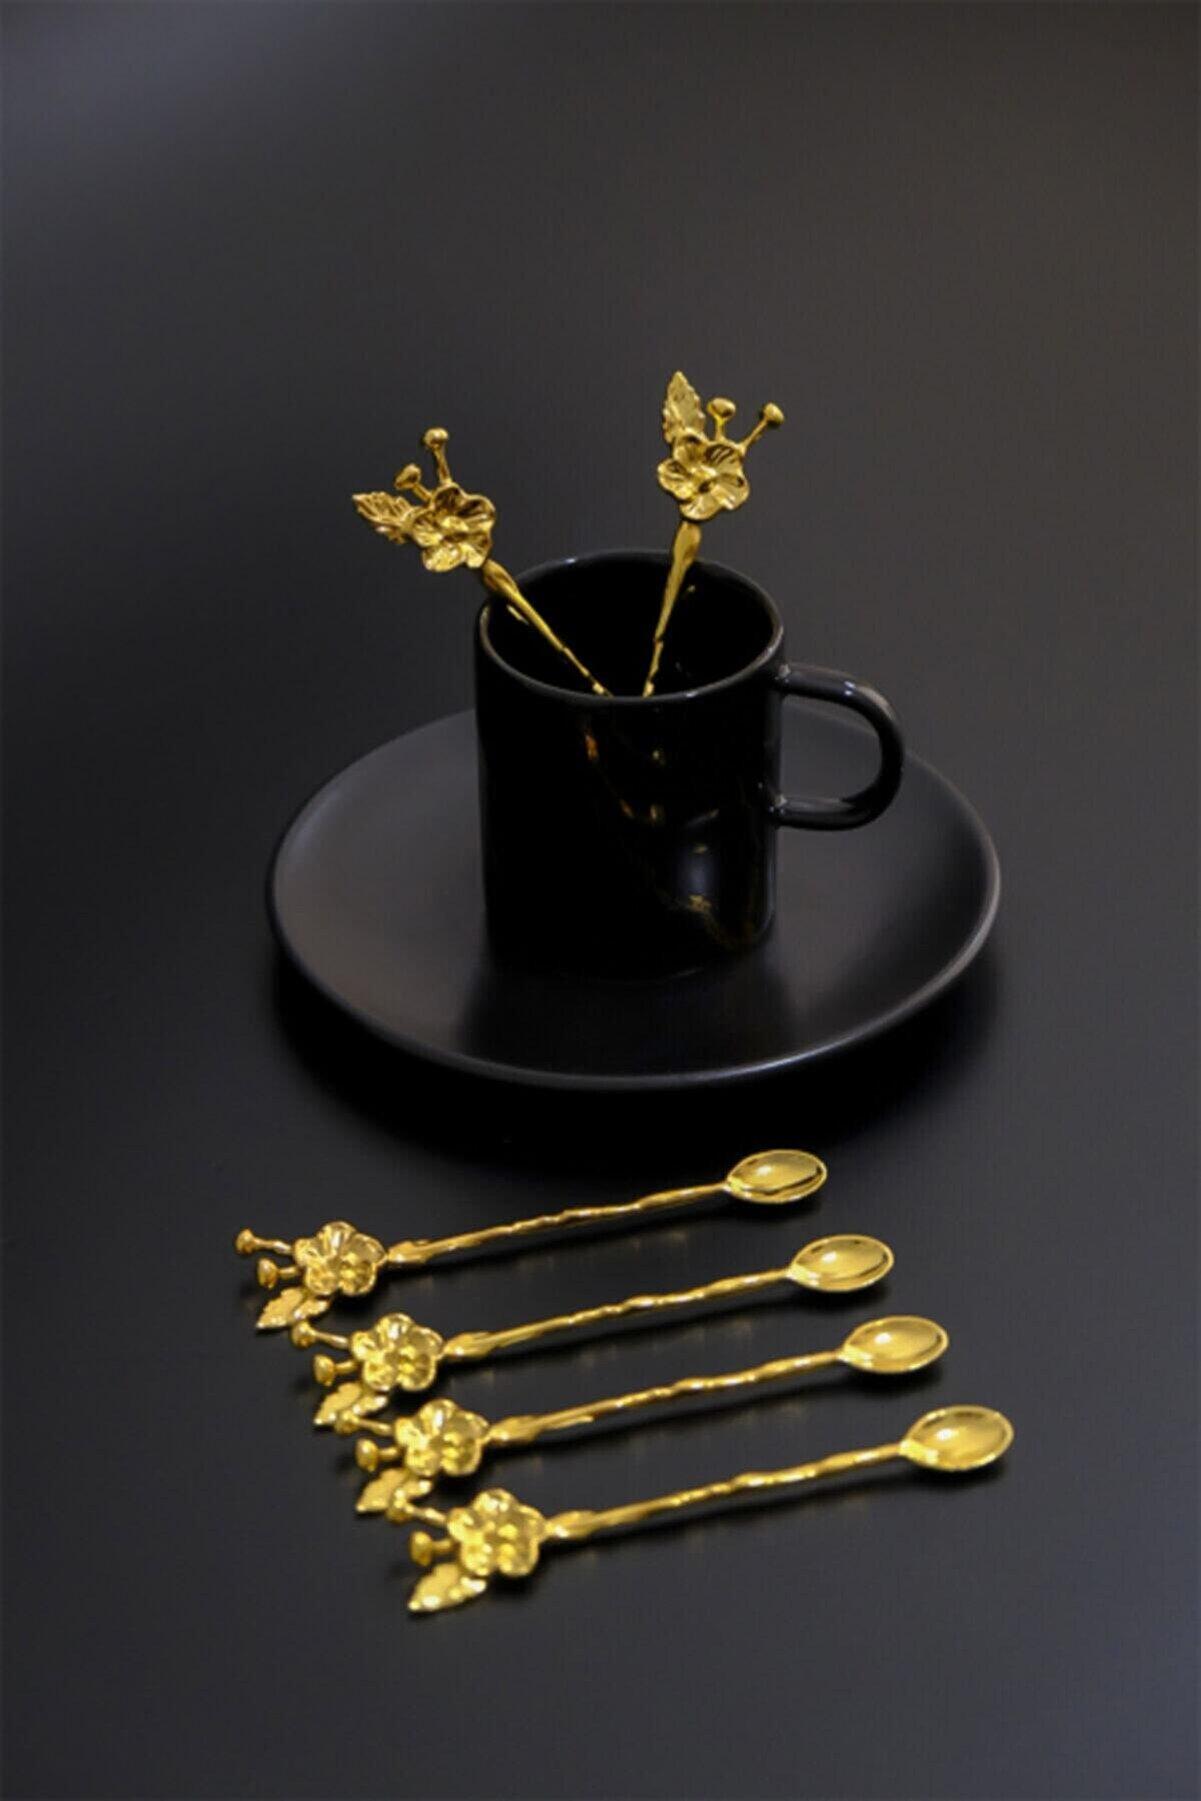 vipgross 6 Kişilik Lüx Çay Kaşığı Gold Japon Gülü